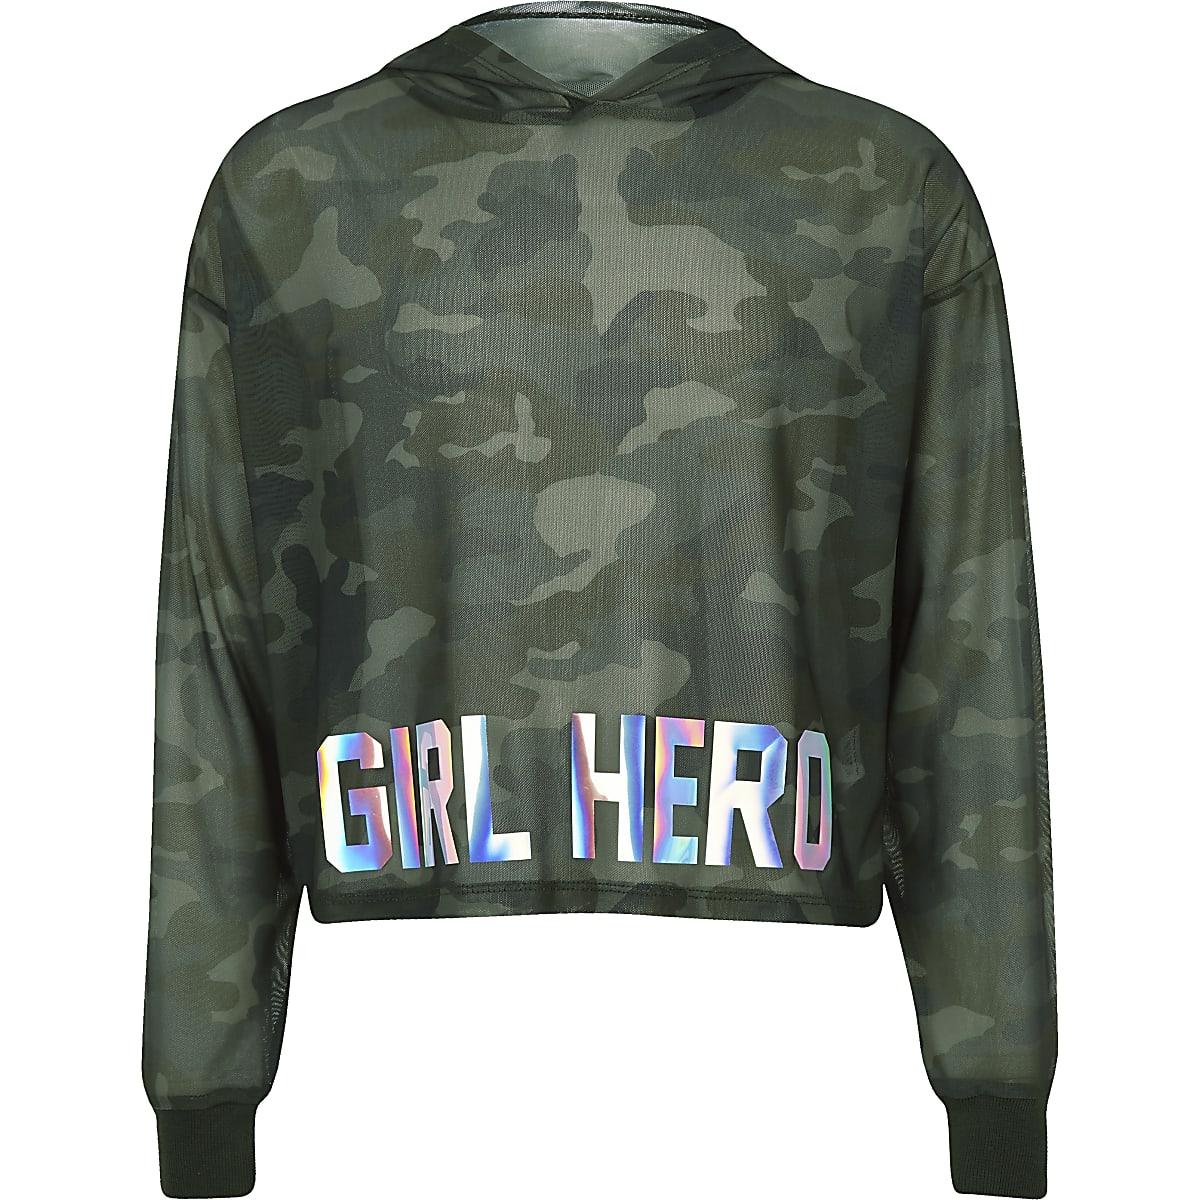 71afb49c3d8 Girls RI Active khaki camo mesh hoodie - Hoodies / Sweatshirts - Tops -  girls